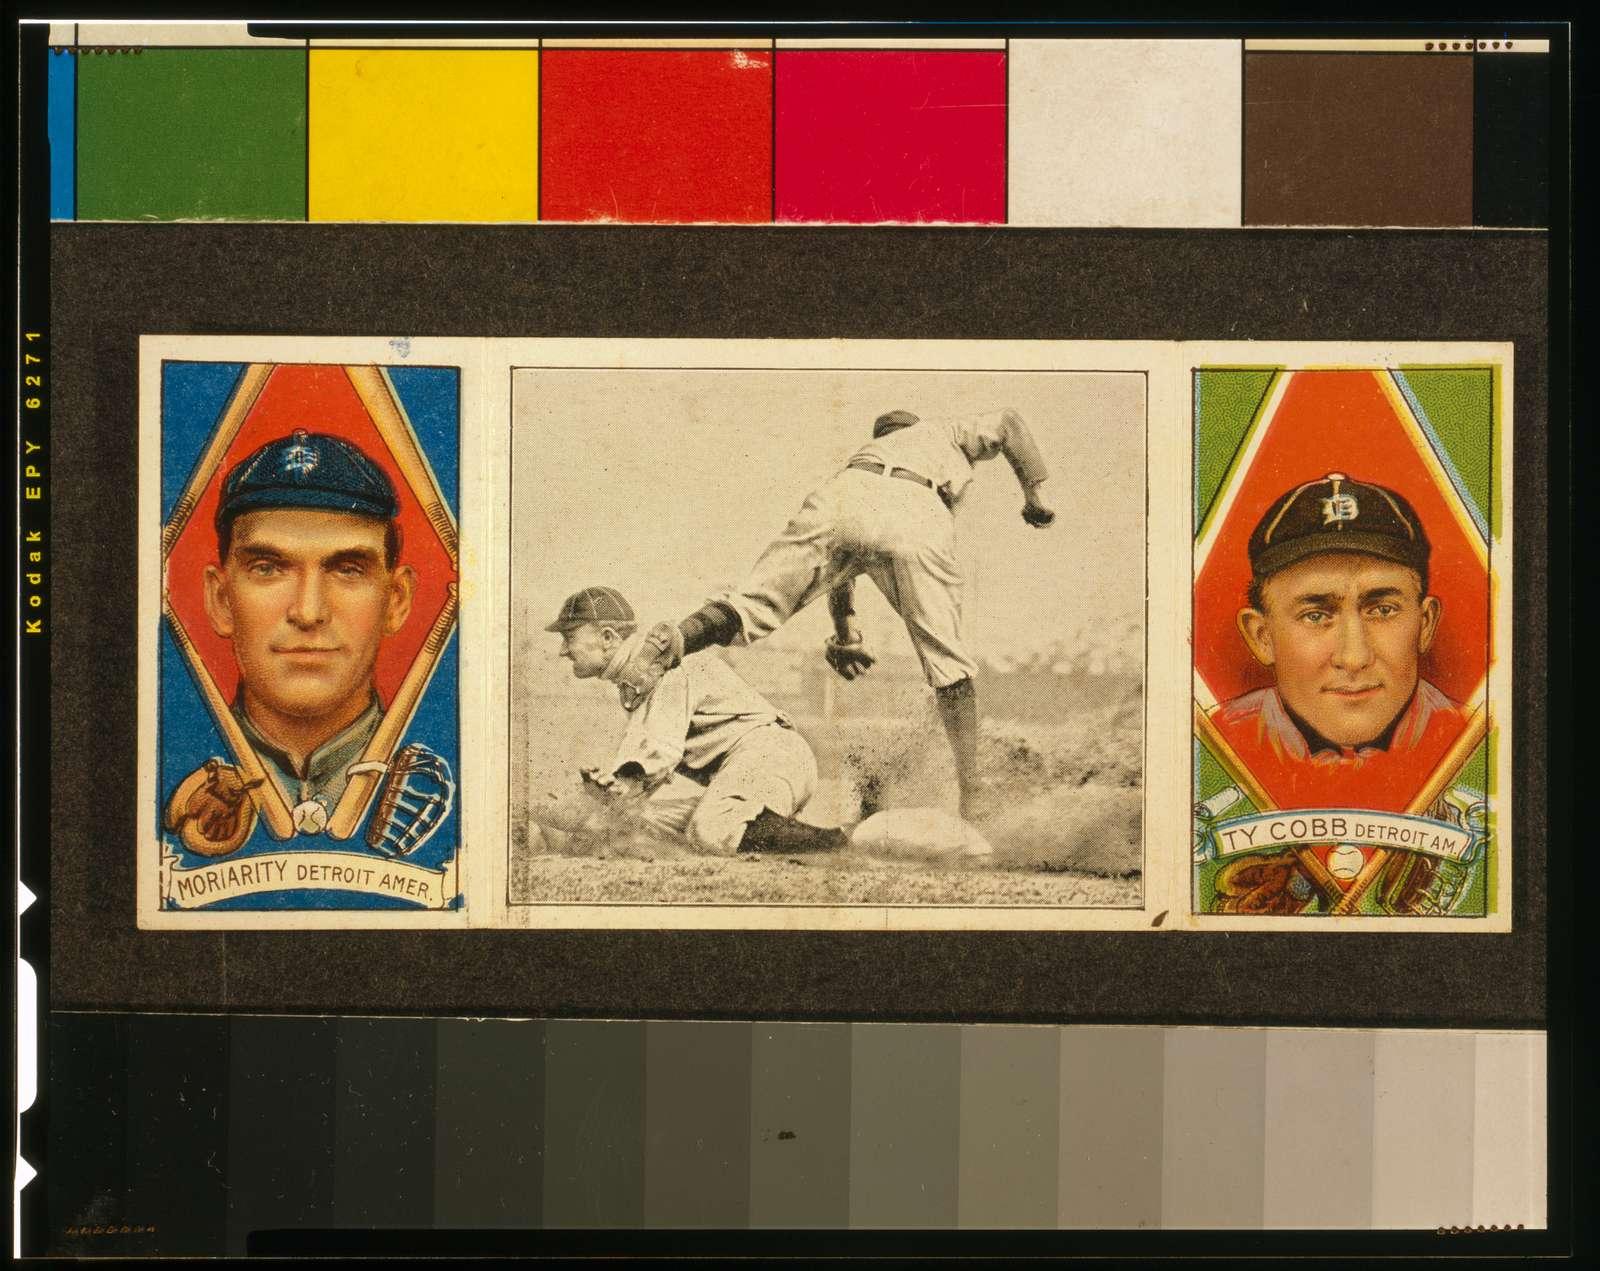 [Geo. Moriarty/Ty Cobb, Detroit Tigers, baseball card portrait]